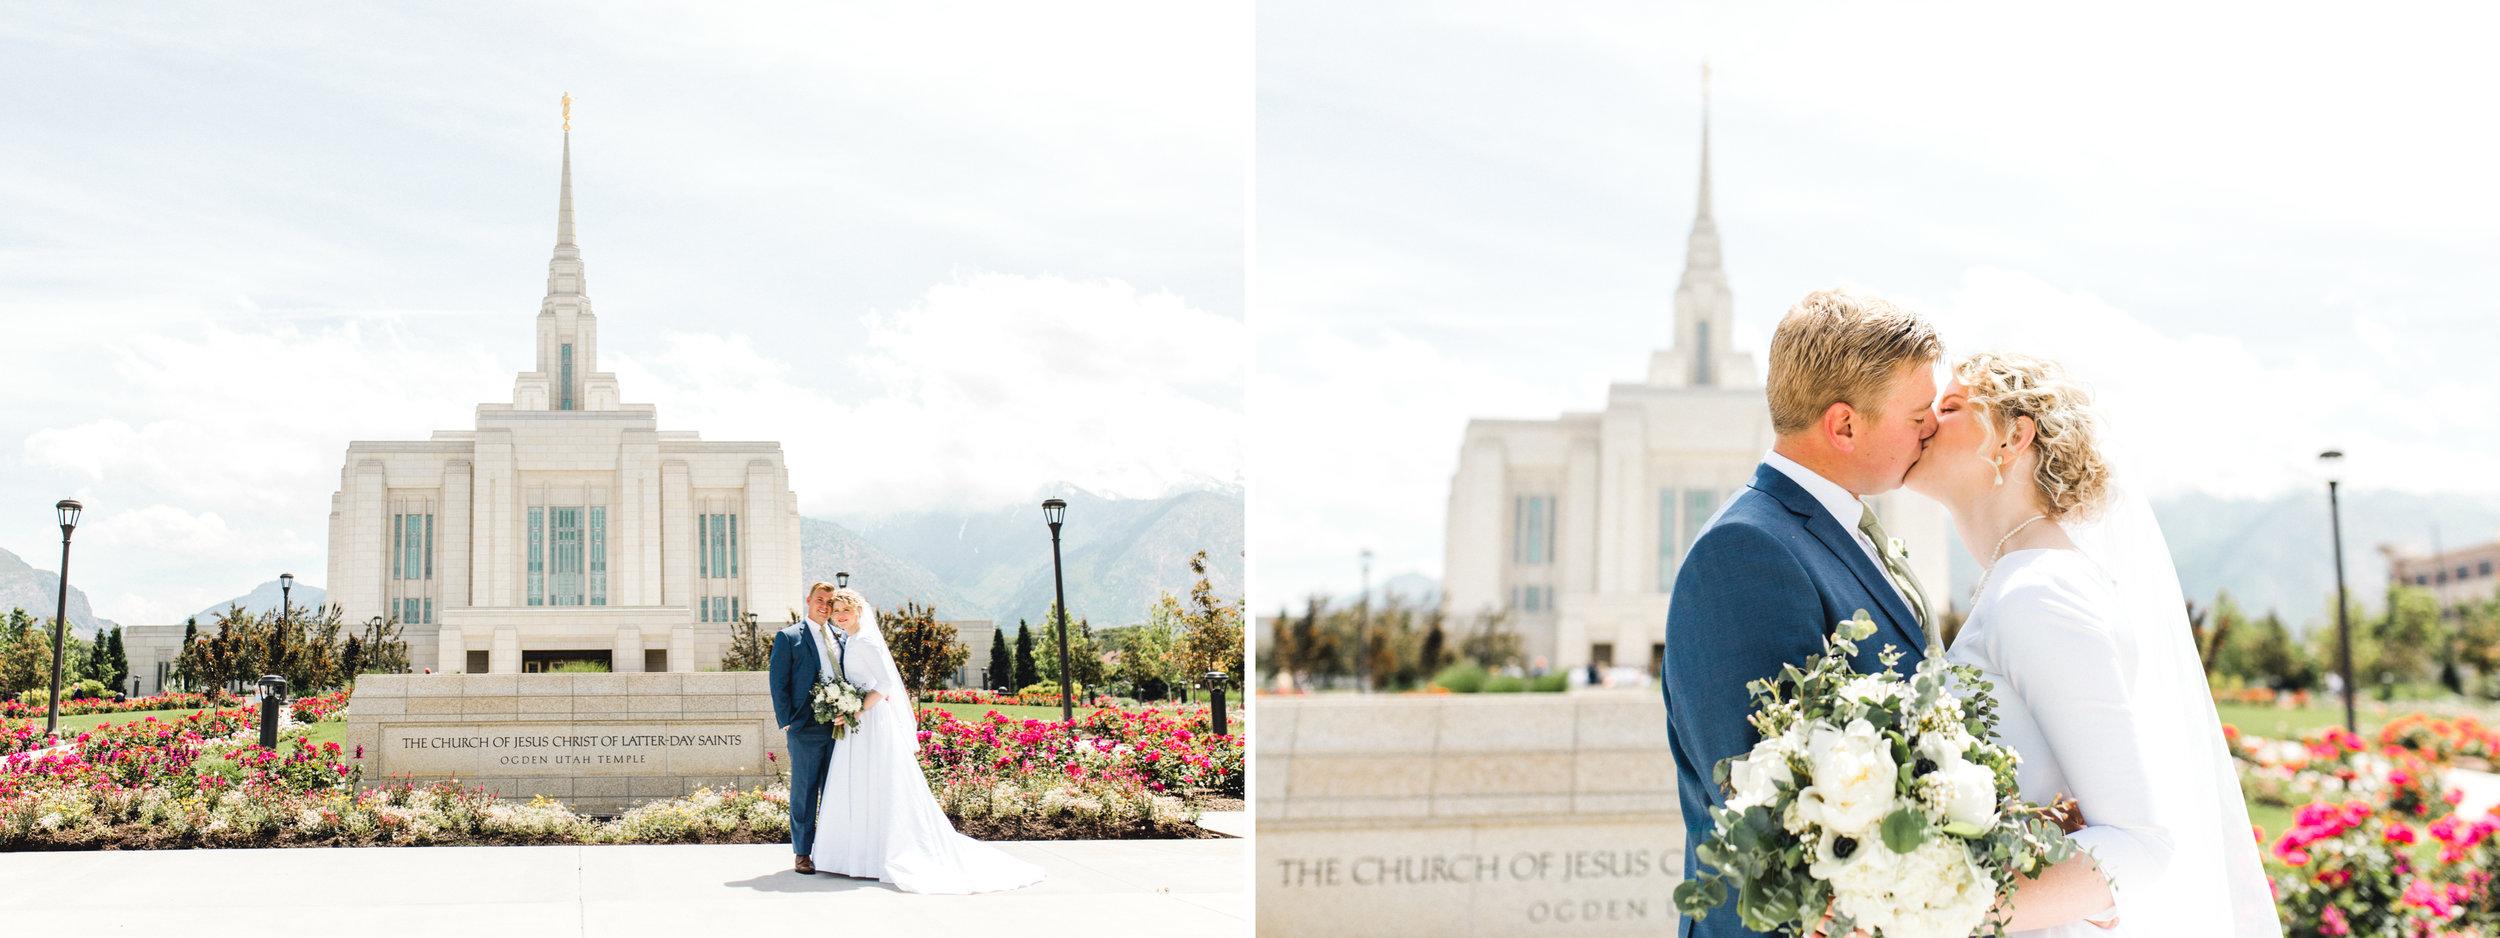 ogden-utah-lds-temple-photographer-anna-christine-photography-noah-emma-12.jpg